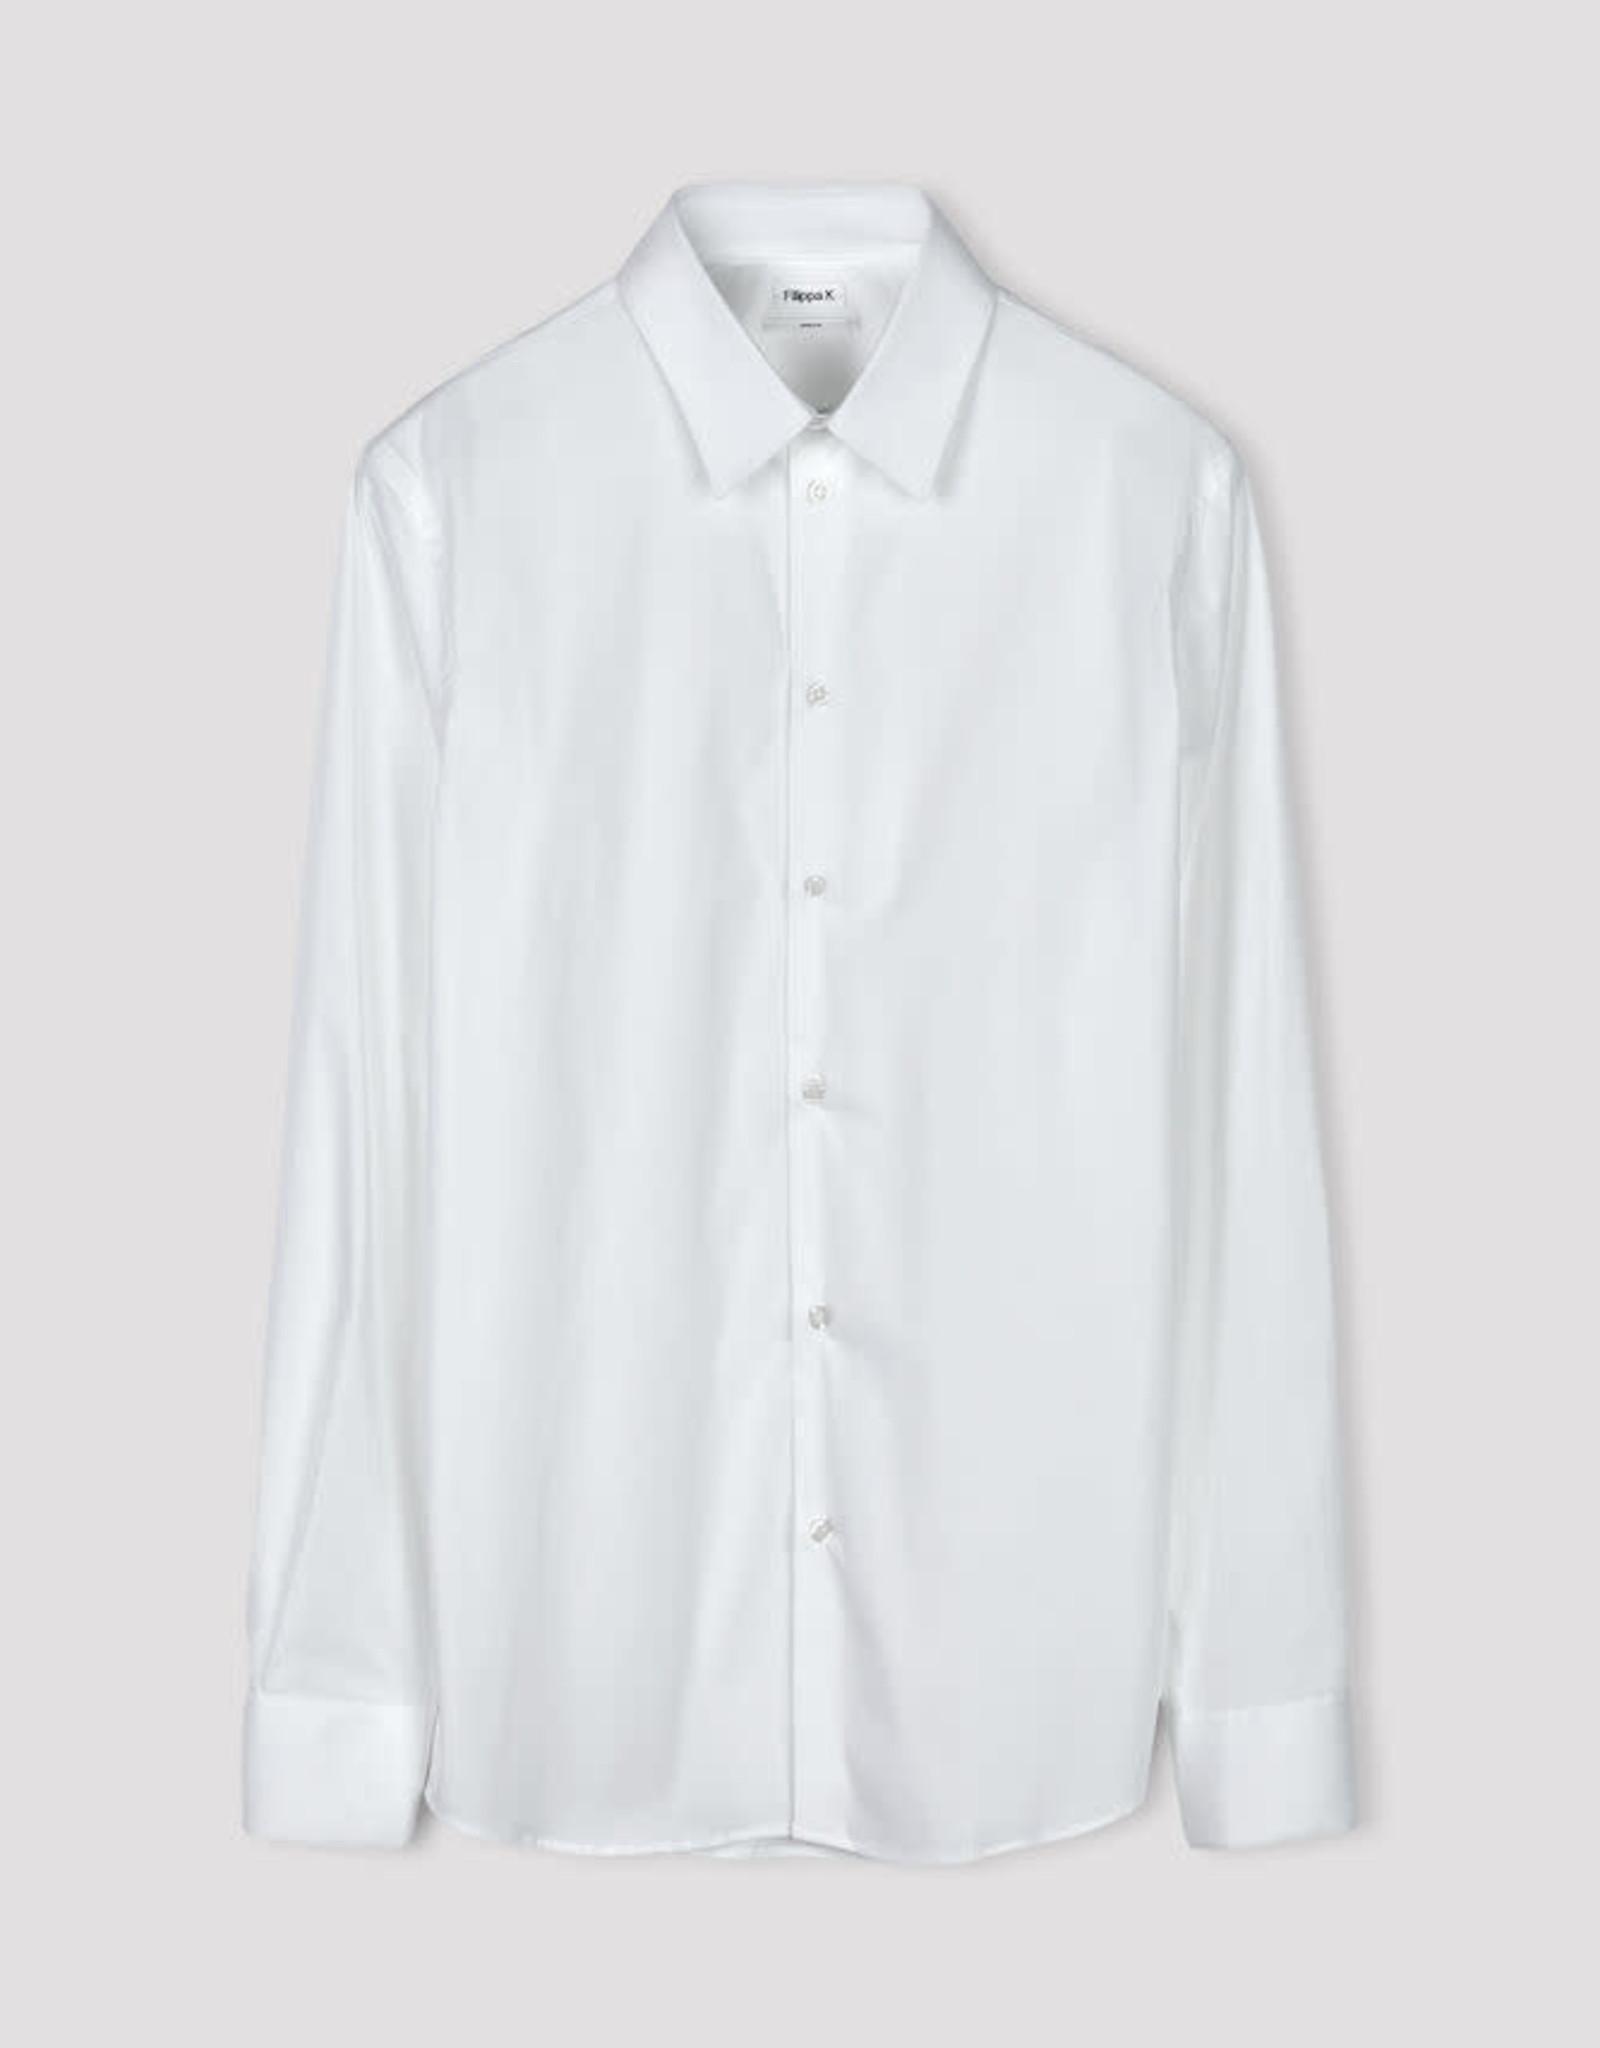 Filippa K M. James Stretch Shirt White